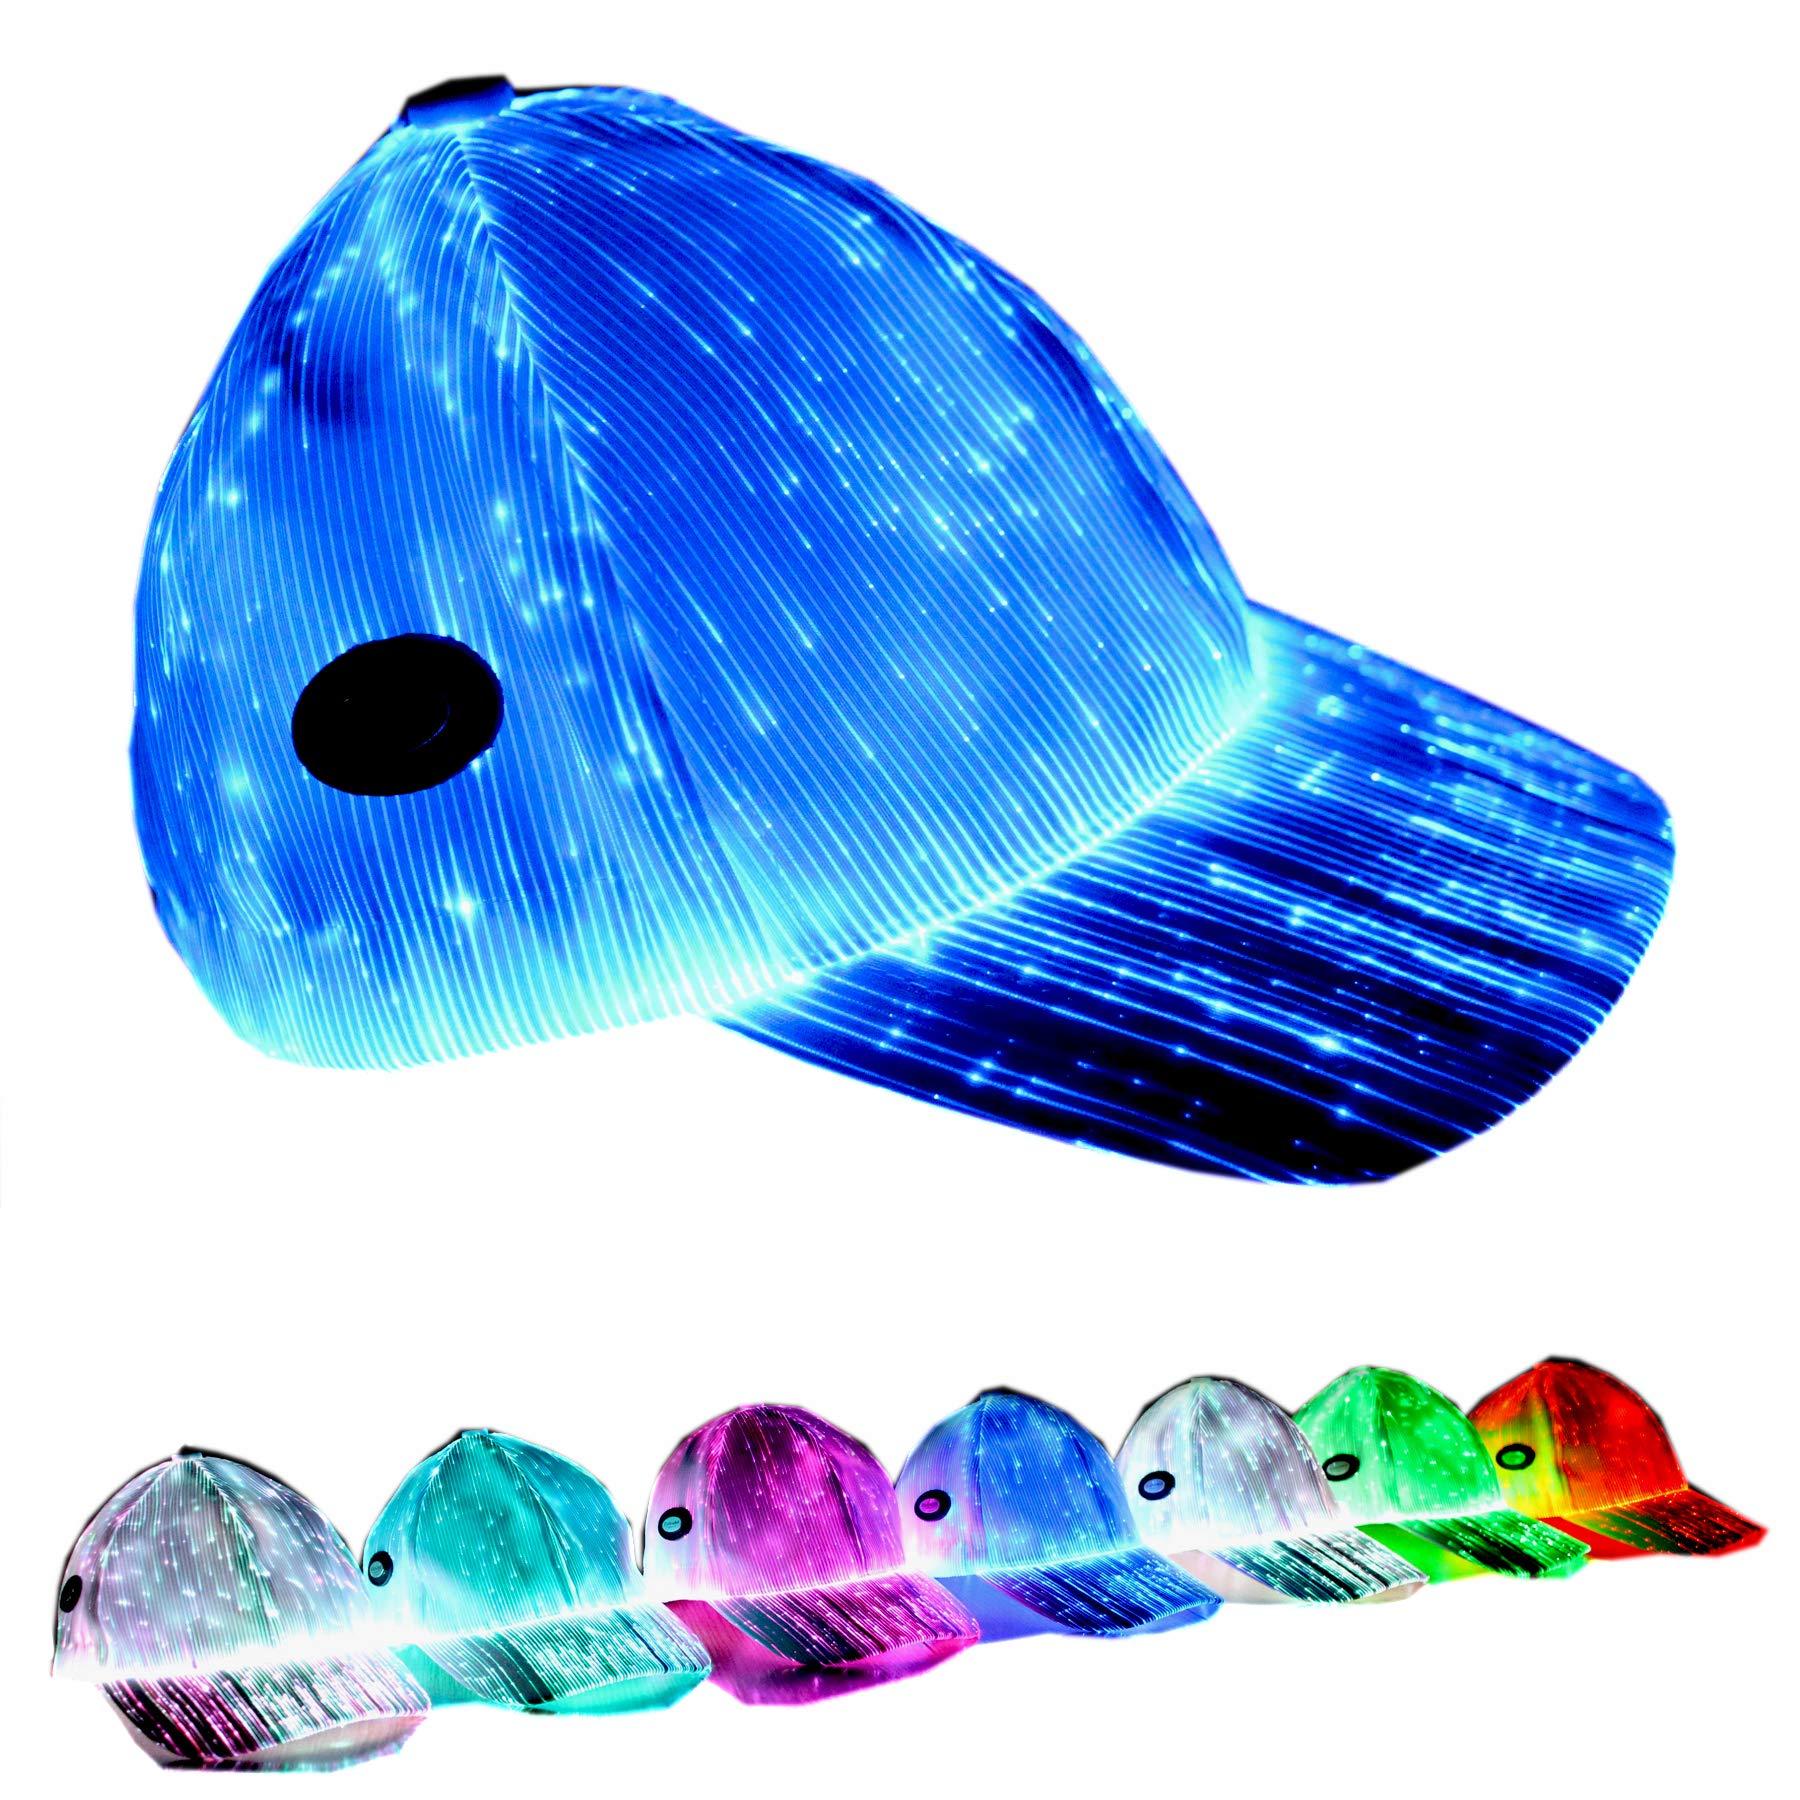 Baseball Caps Flashing Optical Fiber Fabric Baseball Hat Light Up Luminescent Fiber Light Up 7 Colors LED Flash Light RGB Colors a Hat Has 7 Colors White by GALEXBIT